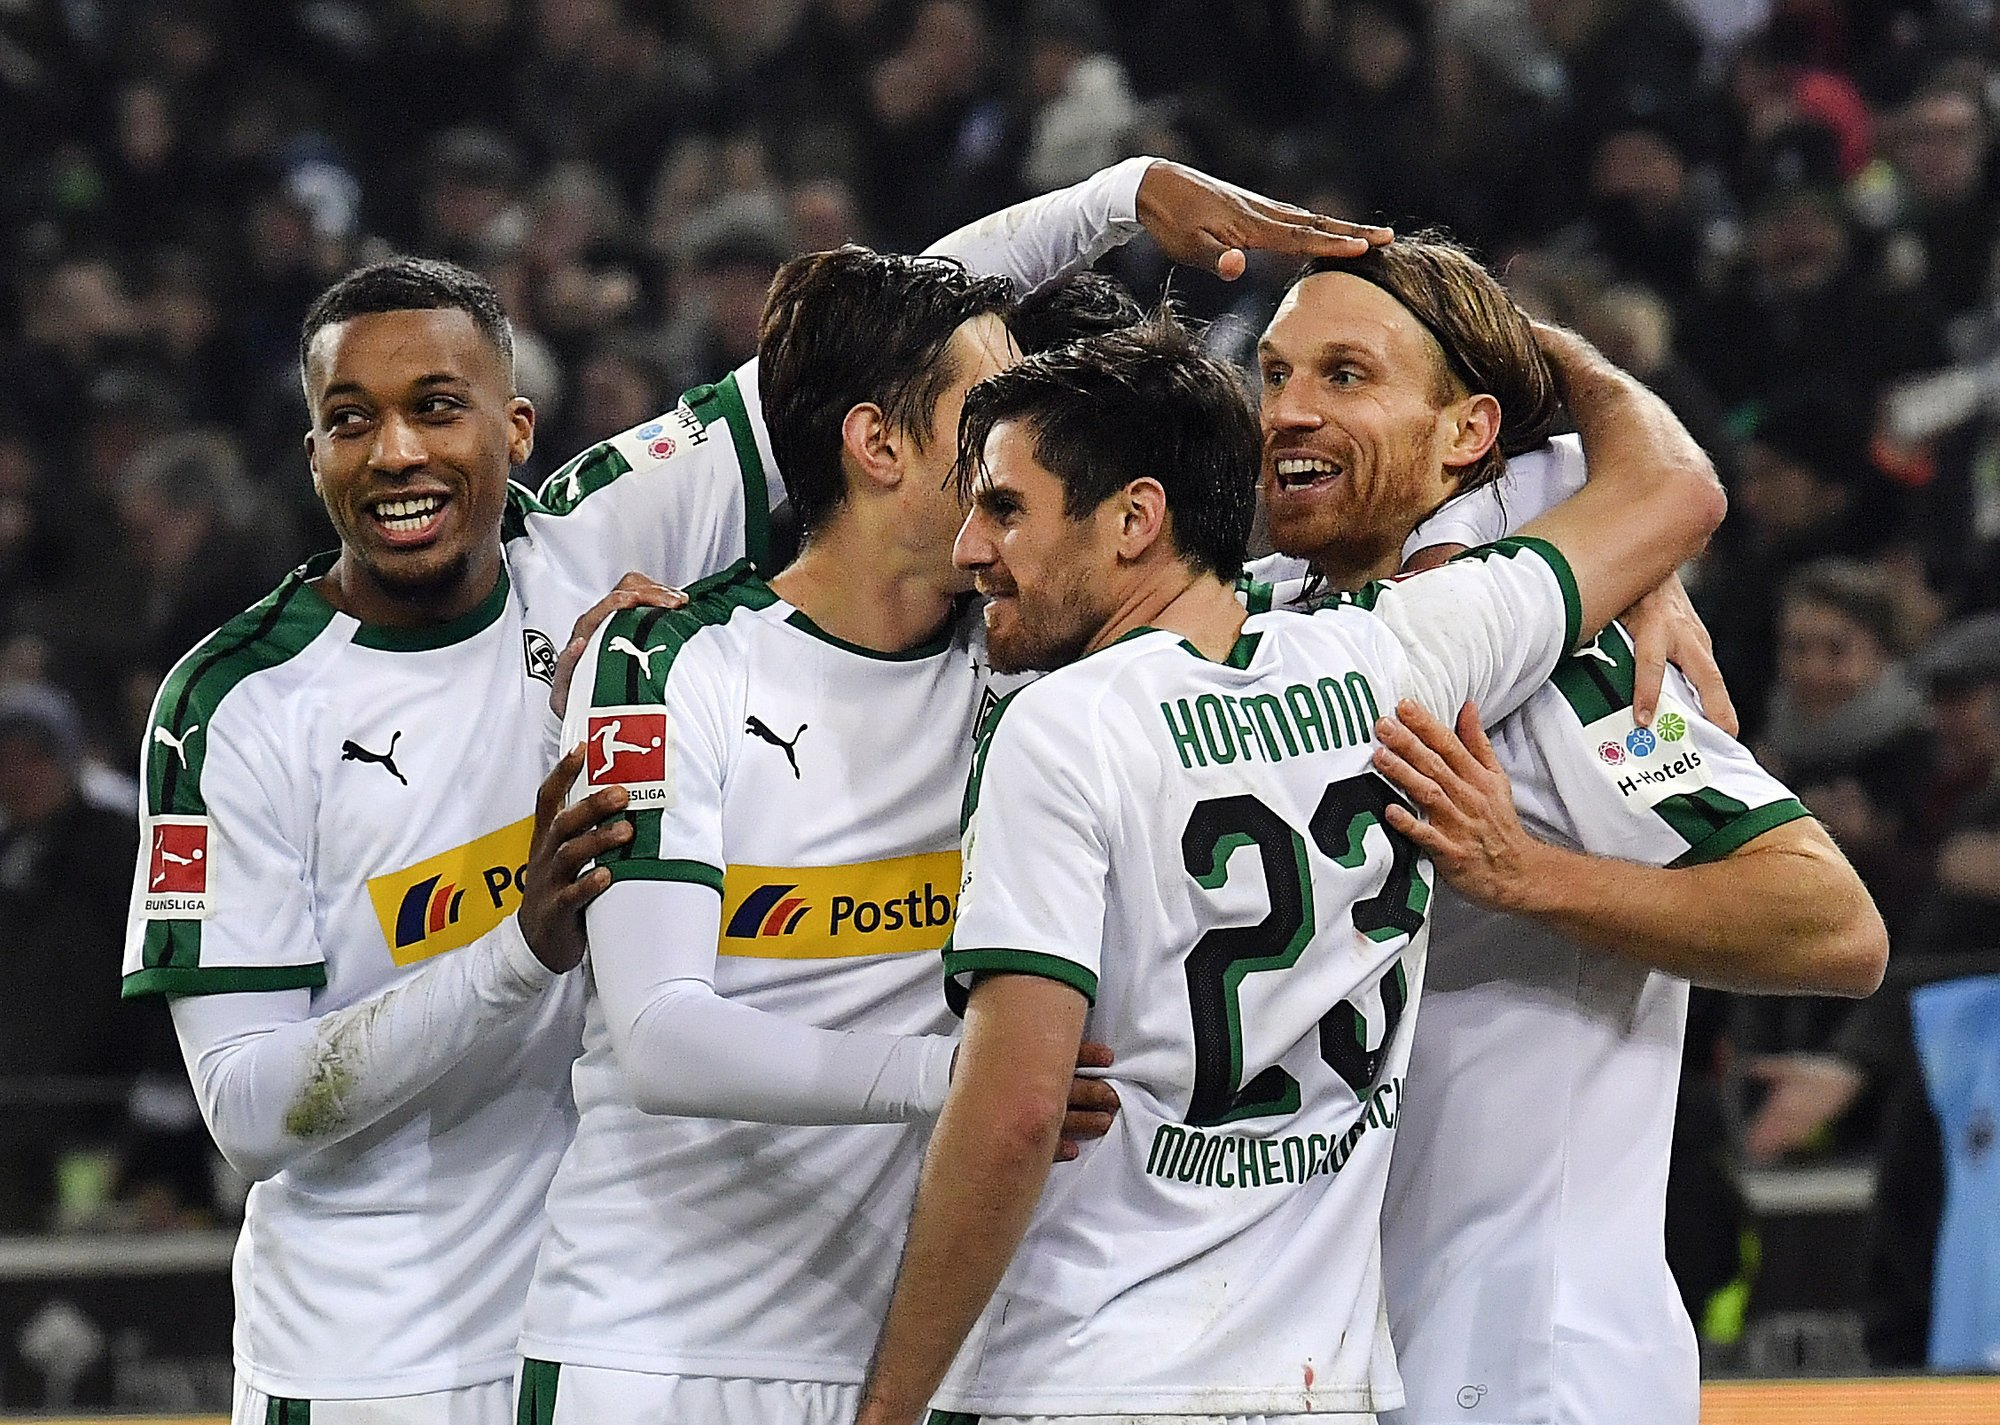 Borussia Mönchengladbach's coaching gamble paying off